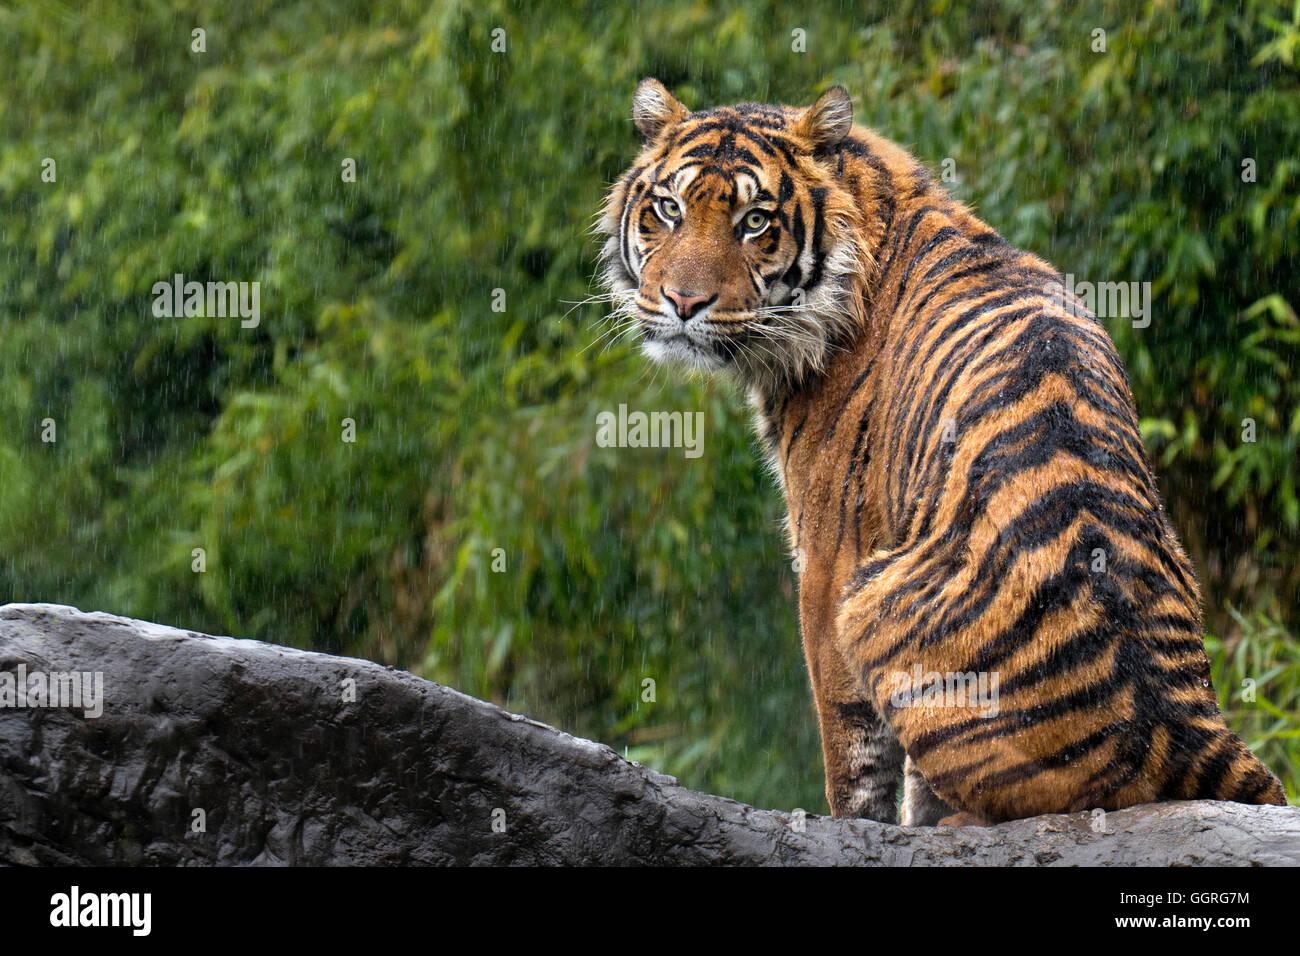 Tigre de Sumatra en la lluvia Imagen De Stock